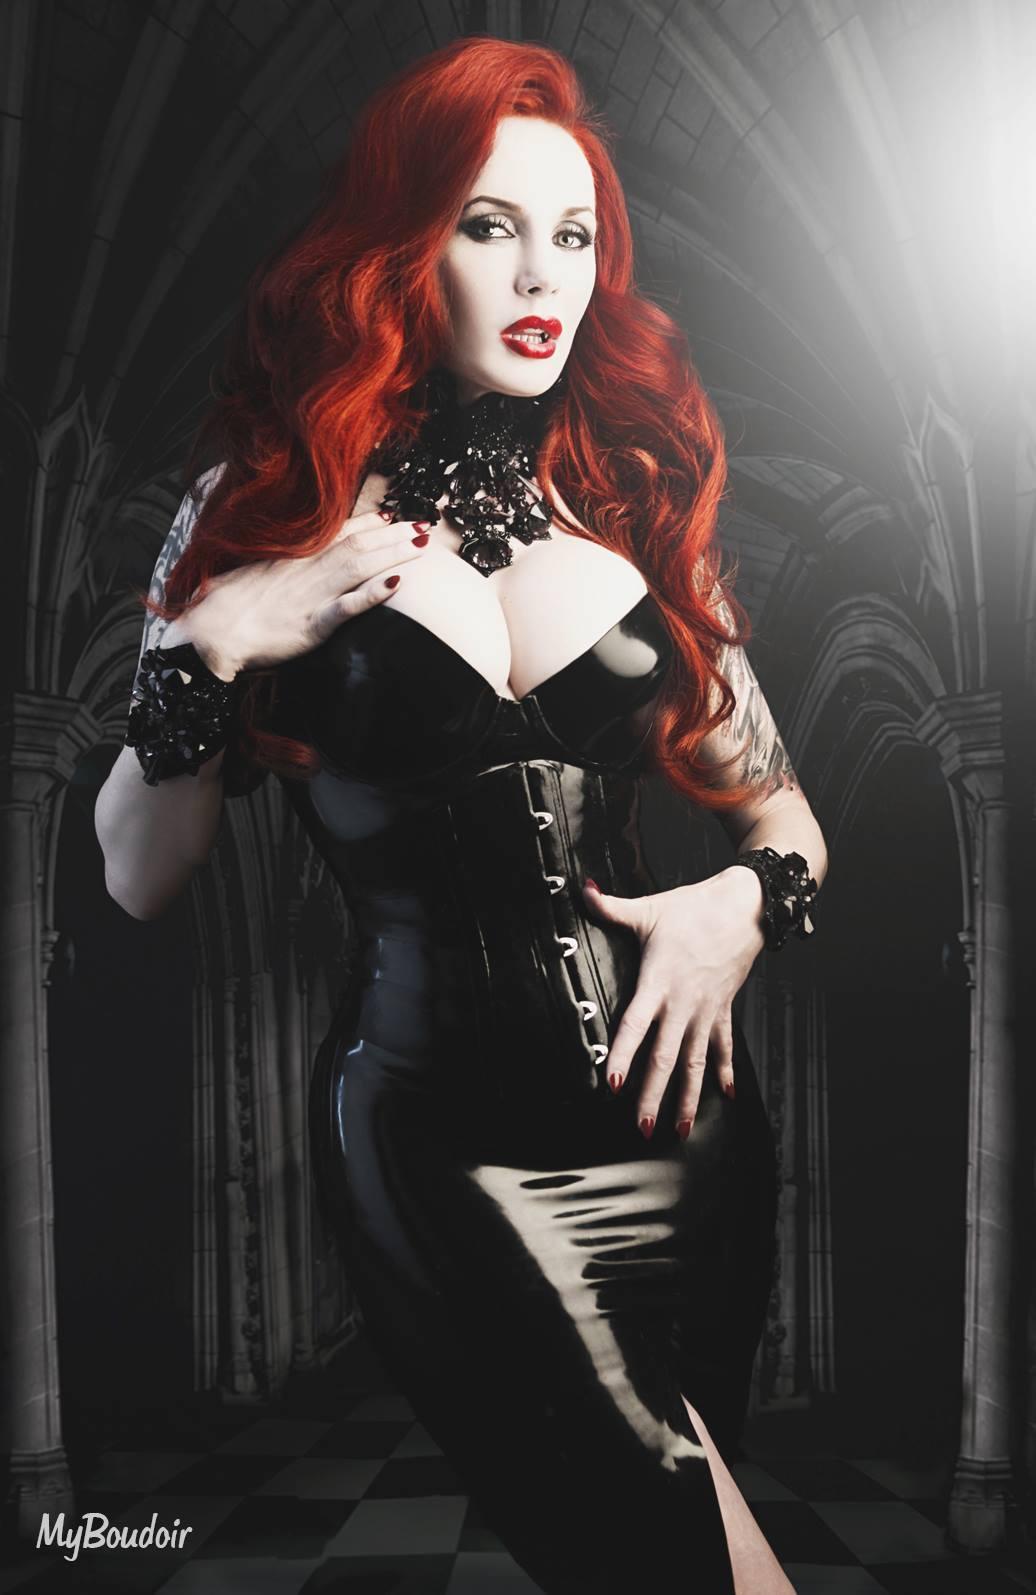 morrigan mistress image hel Lady